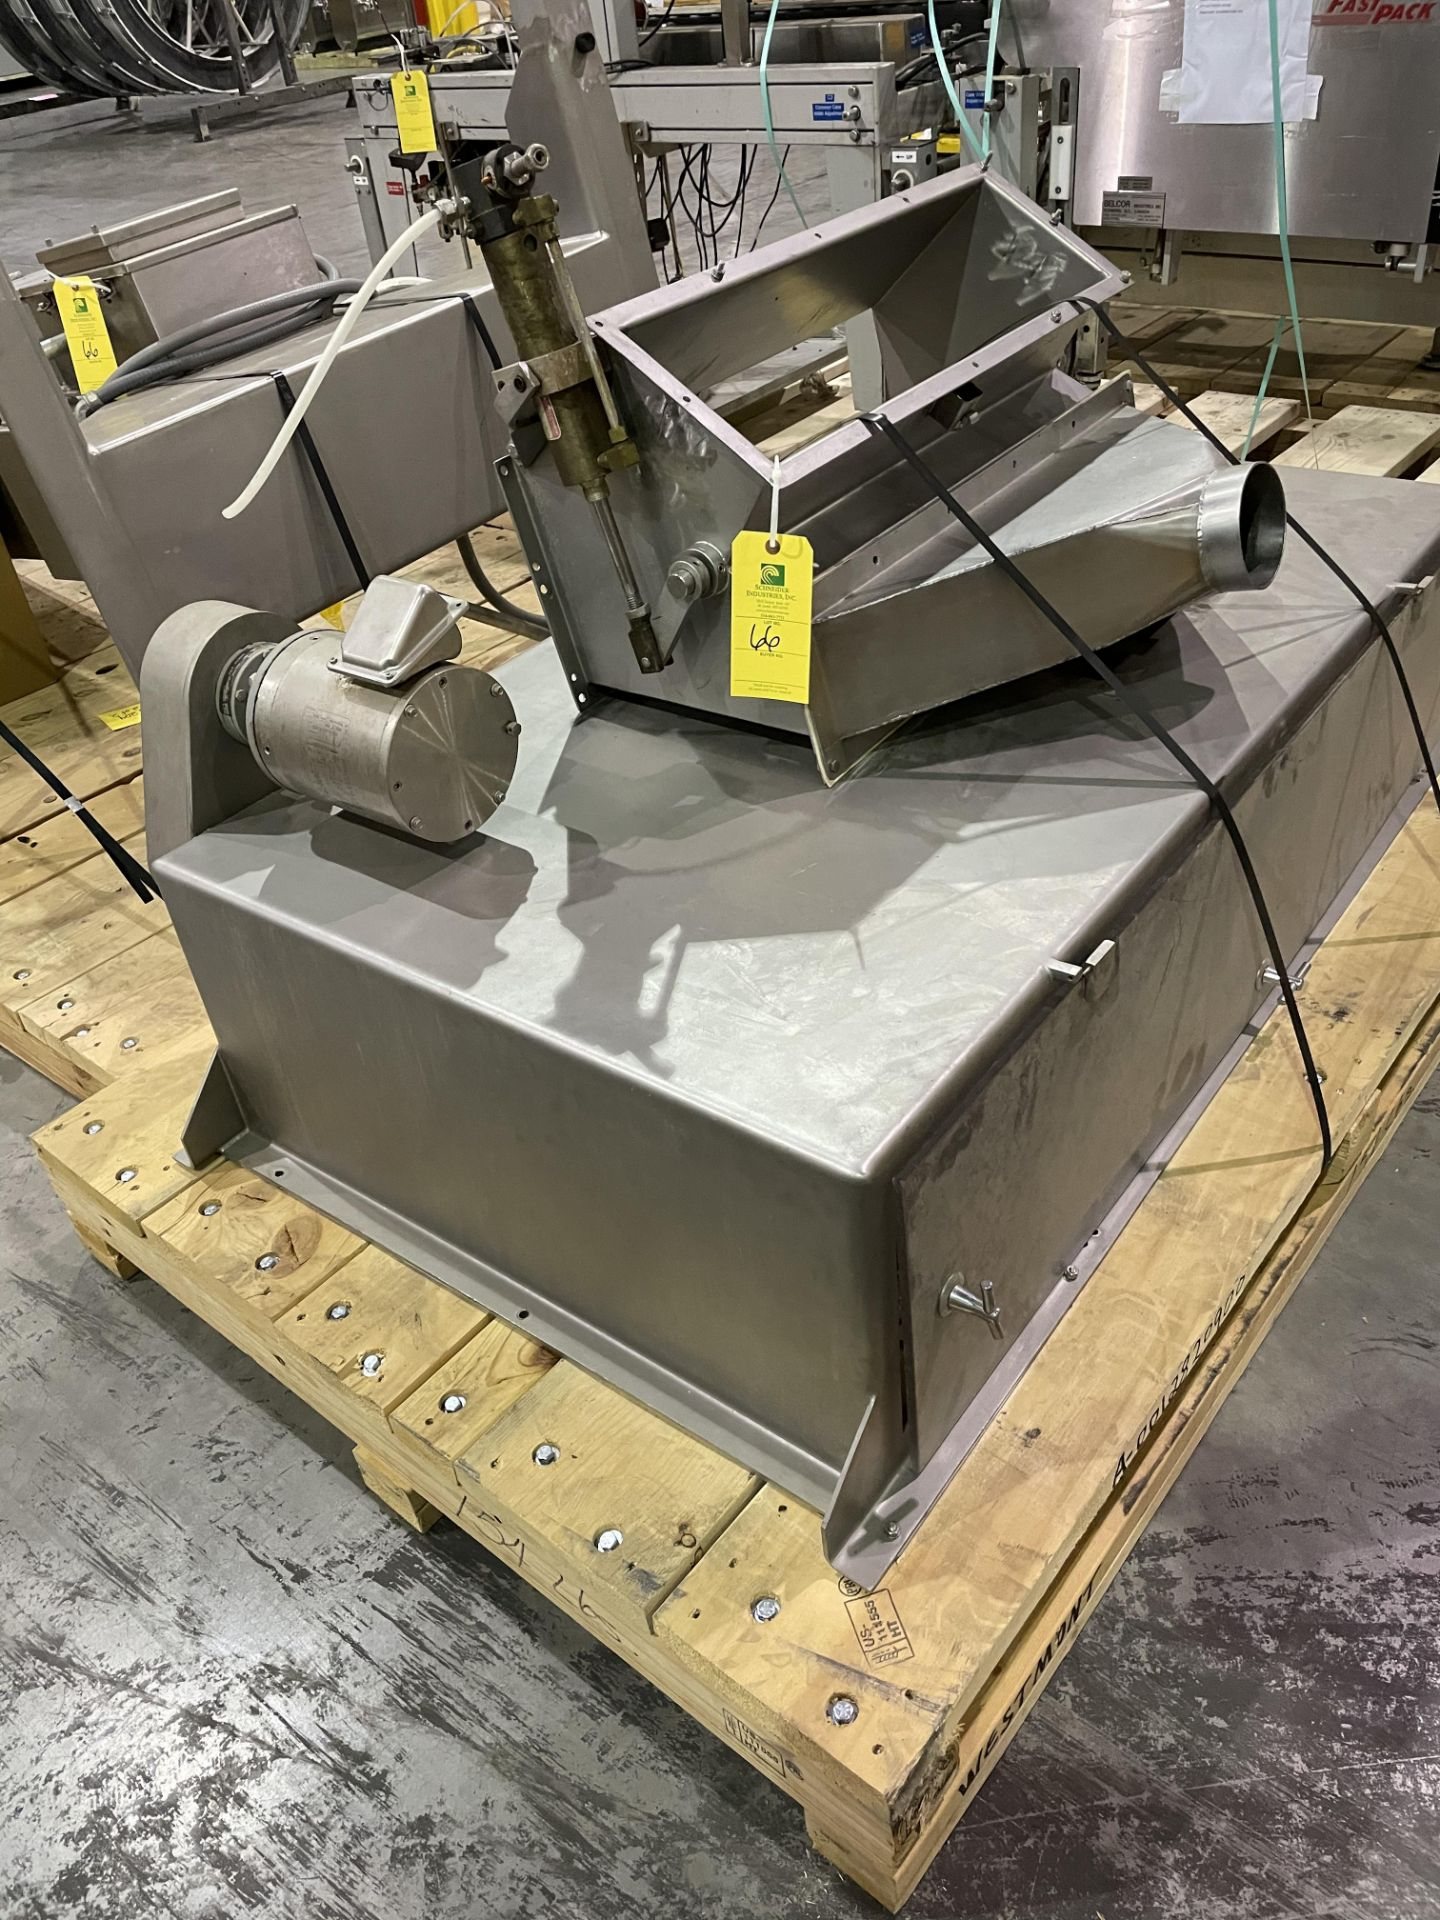 Merrick Weigh Feeder Model 970 S/N 31115 Loading/Rigging Fee $100 - Image 2 of 5